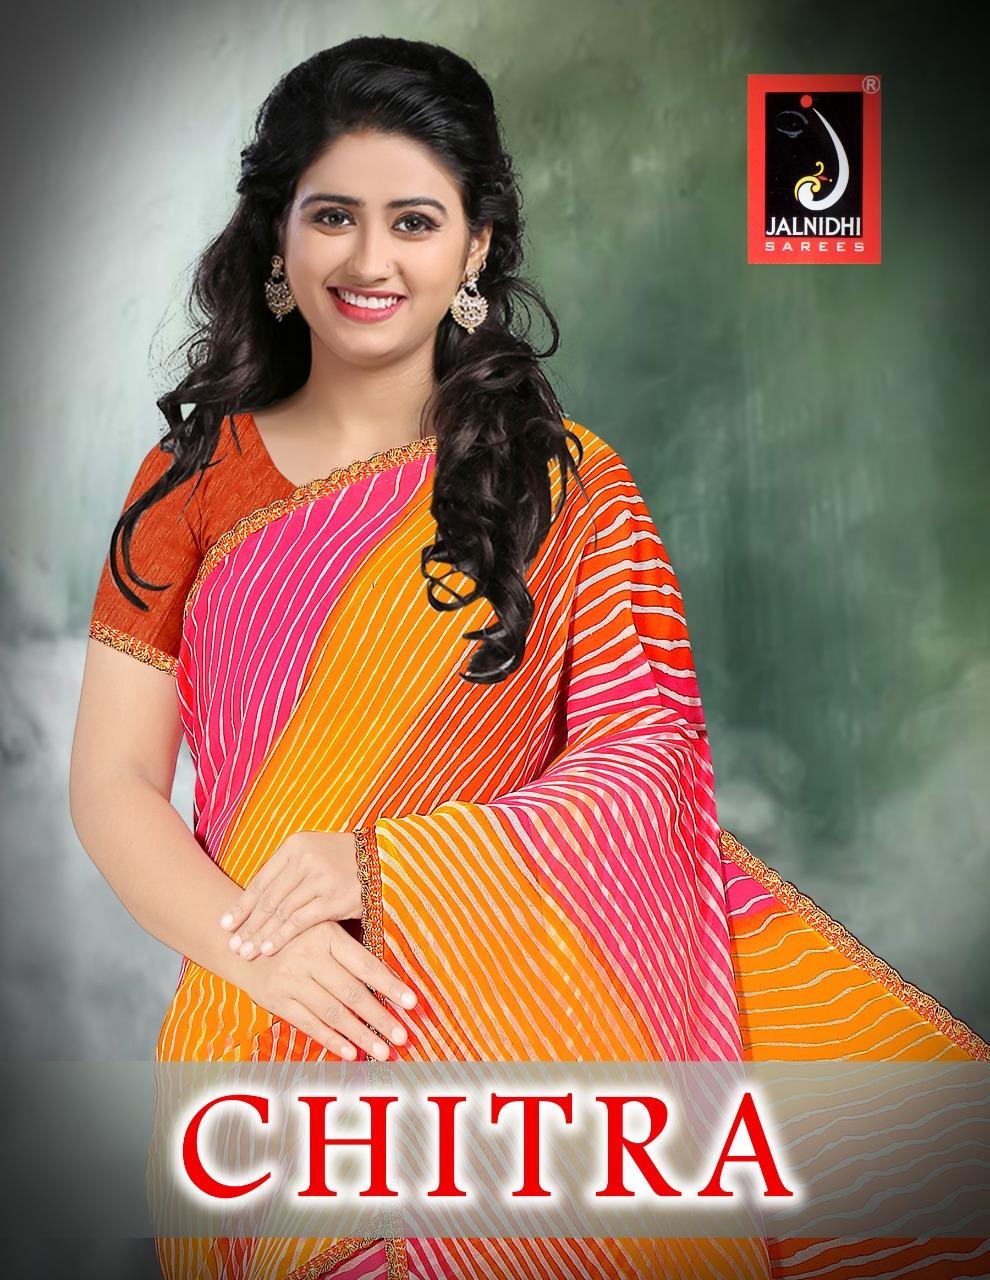 Jalnidhi Chitra Fancy Laheriya With Fancy Border Saree Online Shopping